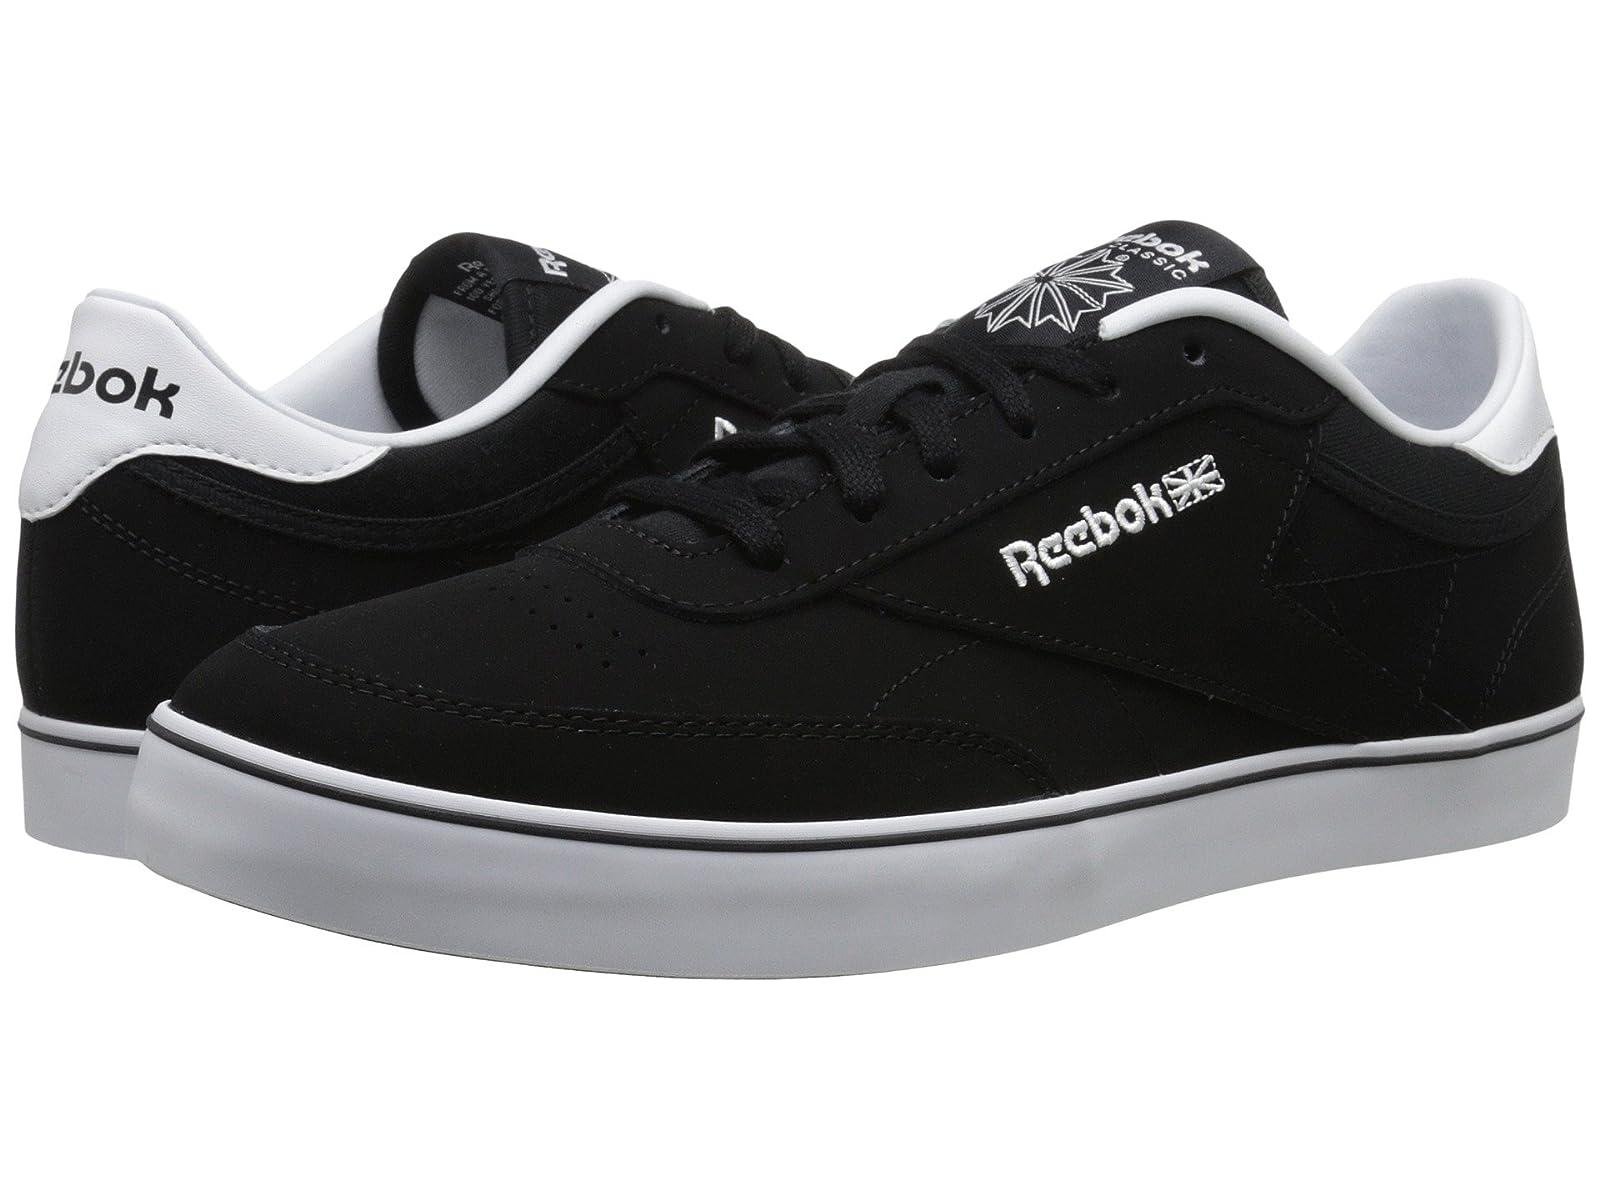 Reebok Lifestyle Club C FVSCheap and distinctive eye-catching shoes